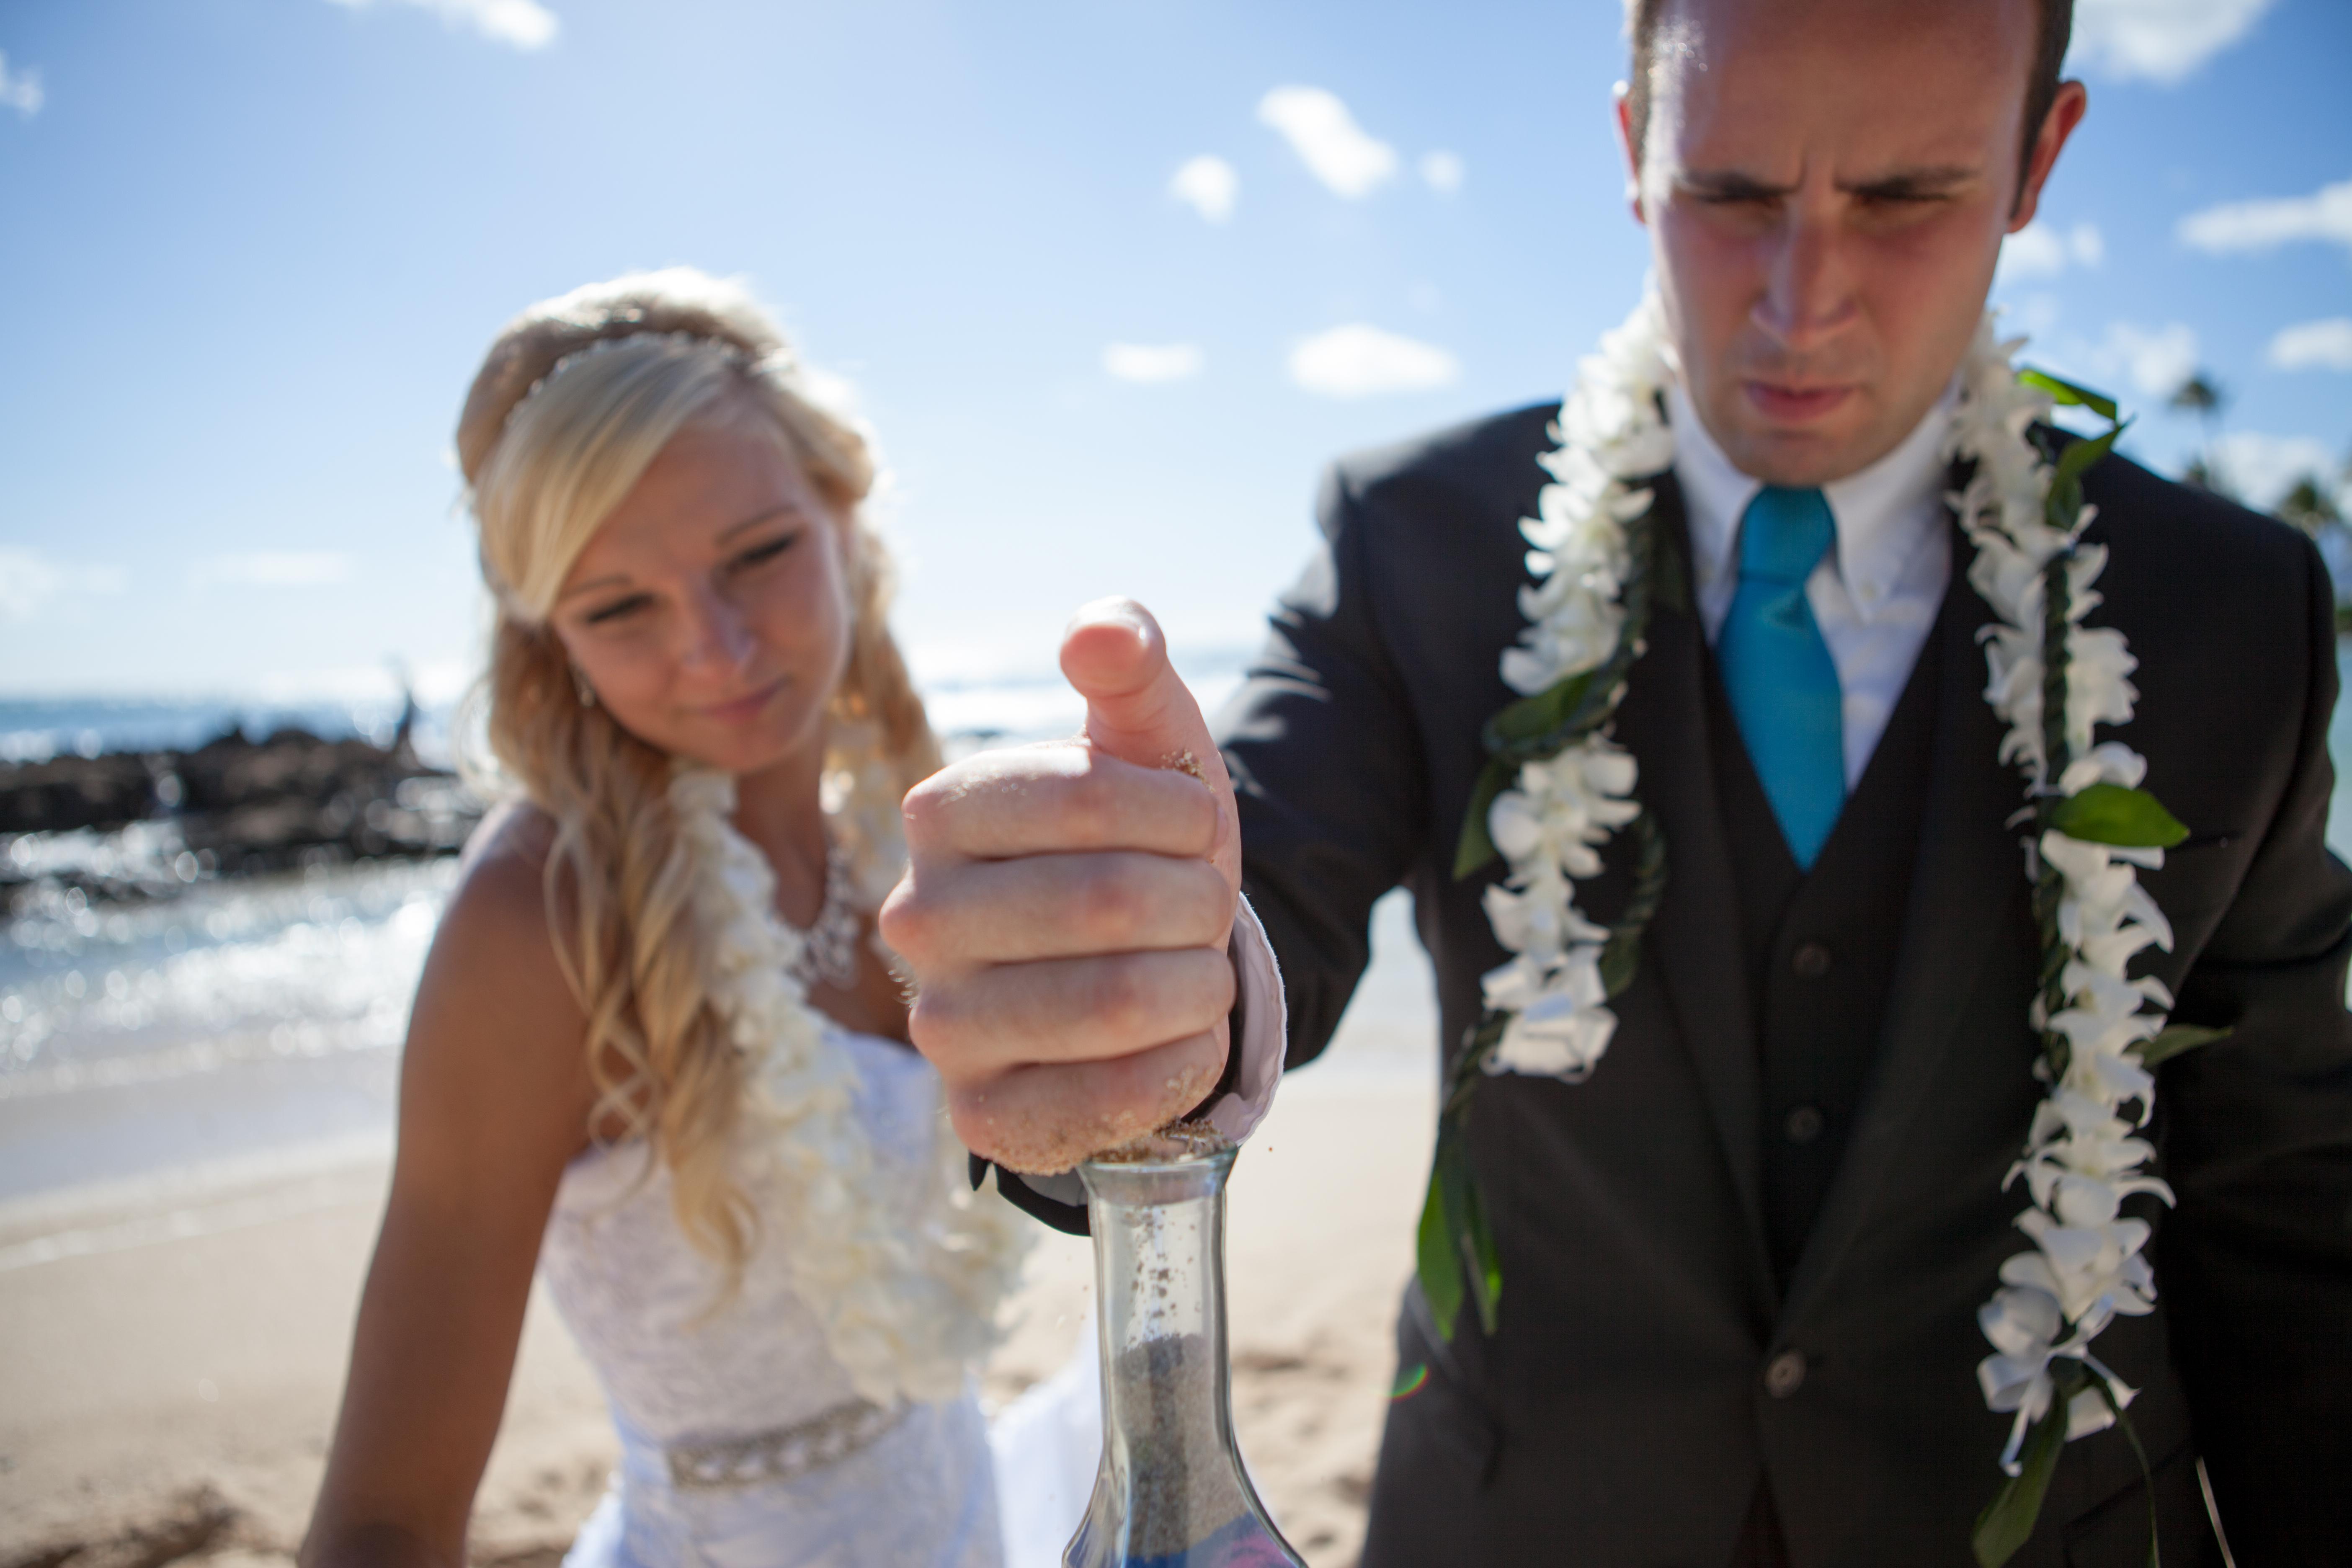 Wedding in Hawaii sand ceremony 12